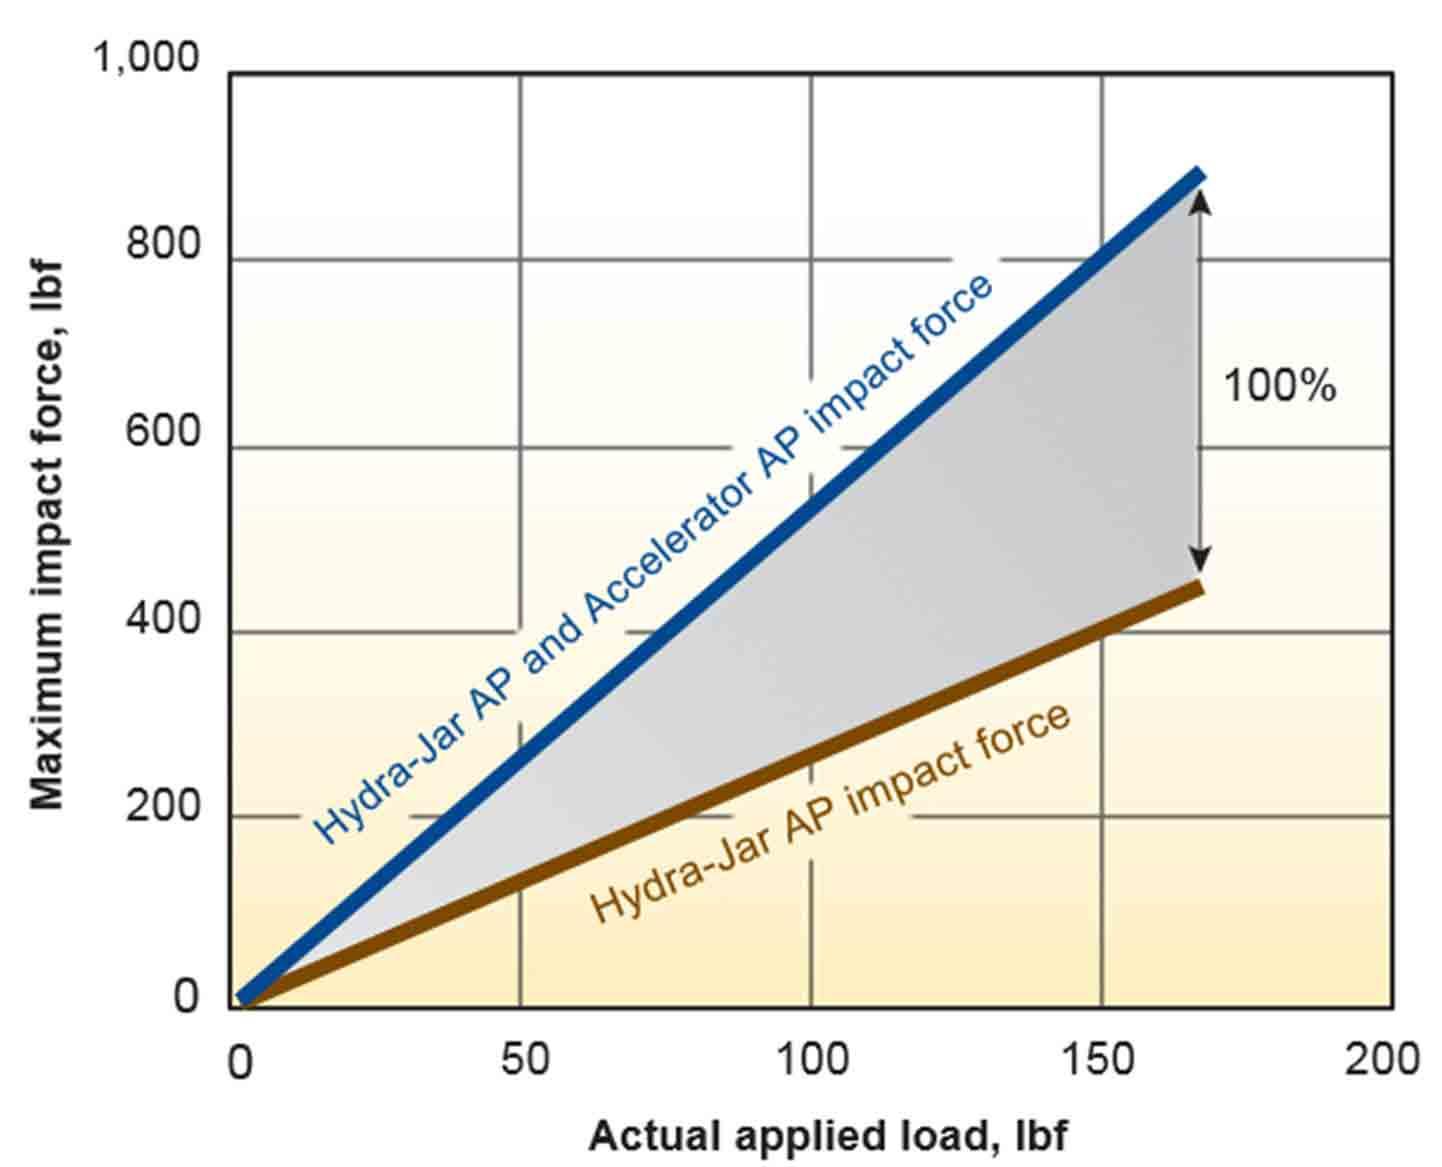 Hydra-Jar AP and Accelerator AP impact force